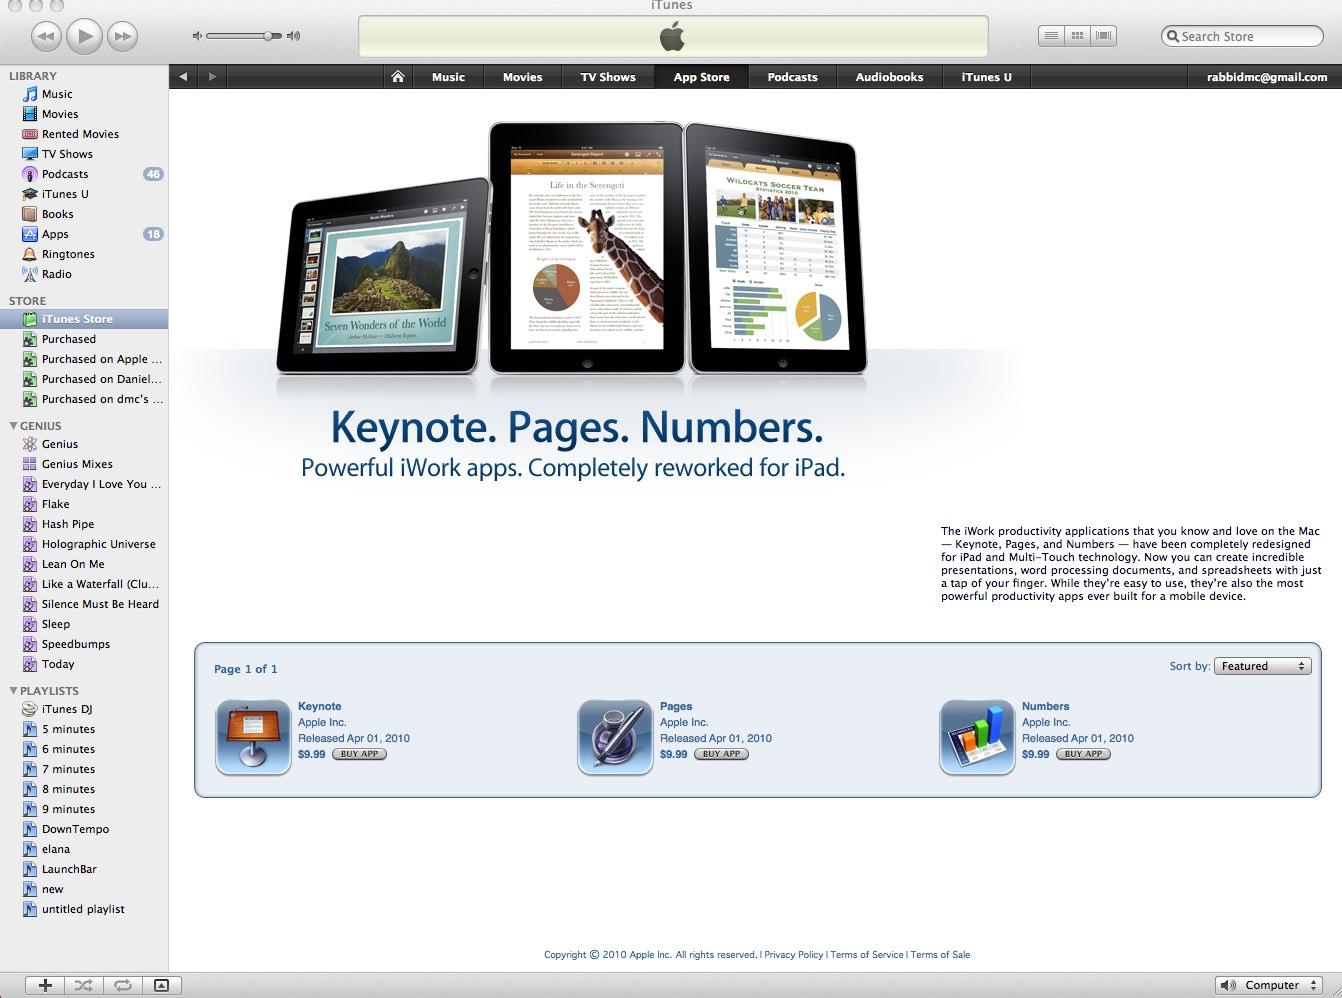 iTunes-48-1.jpg